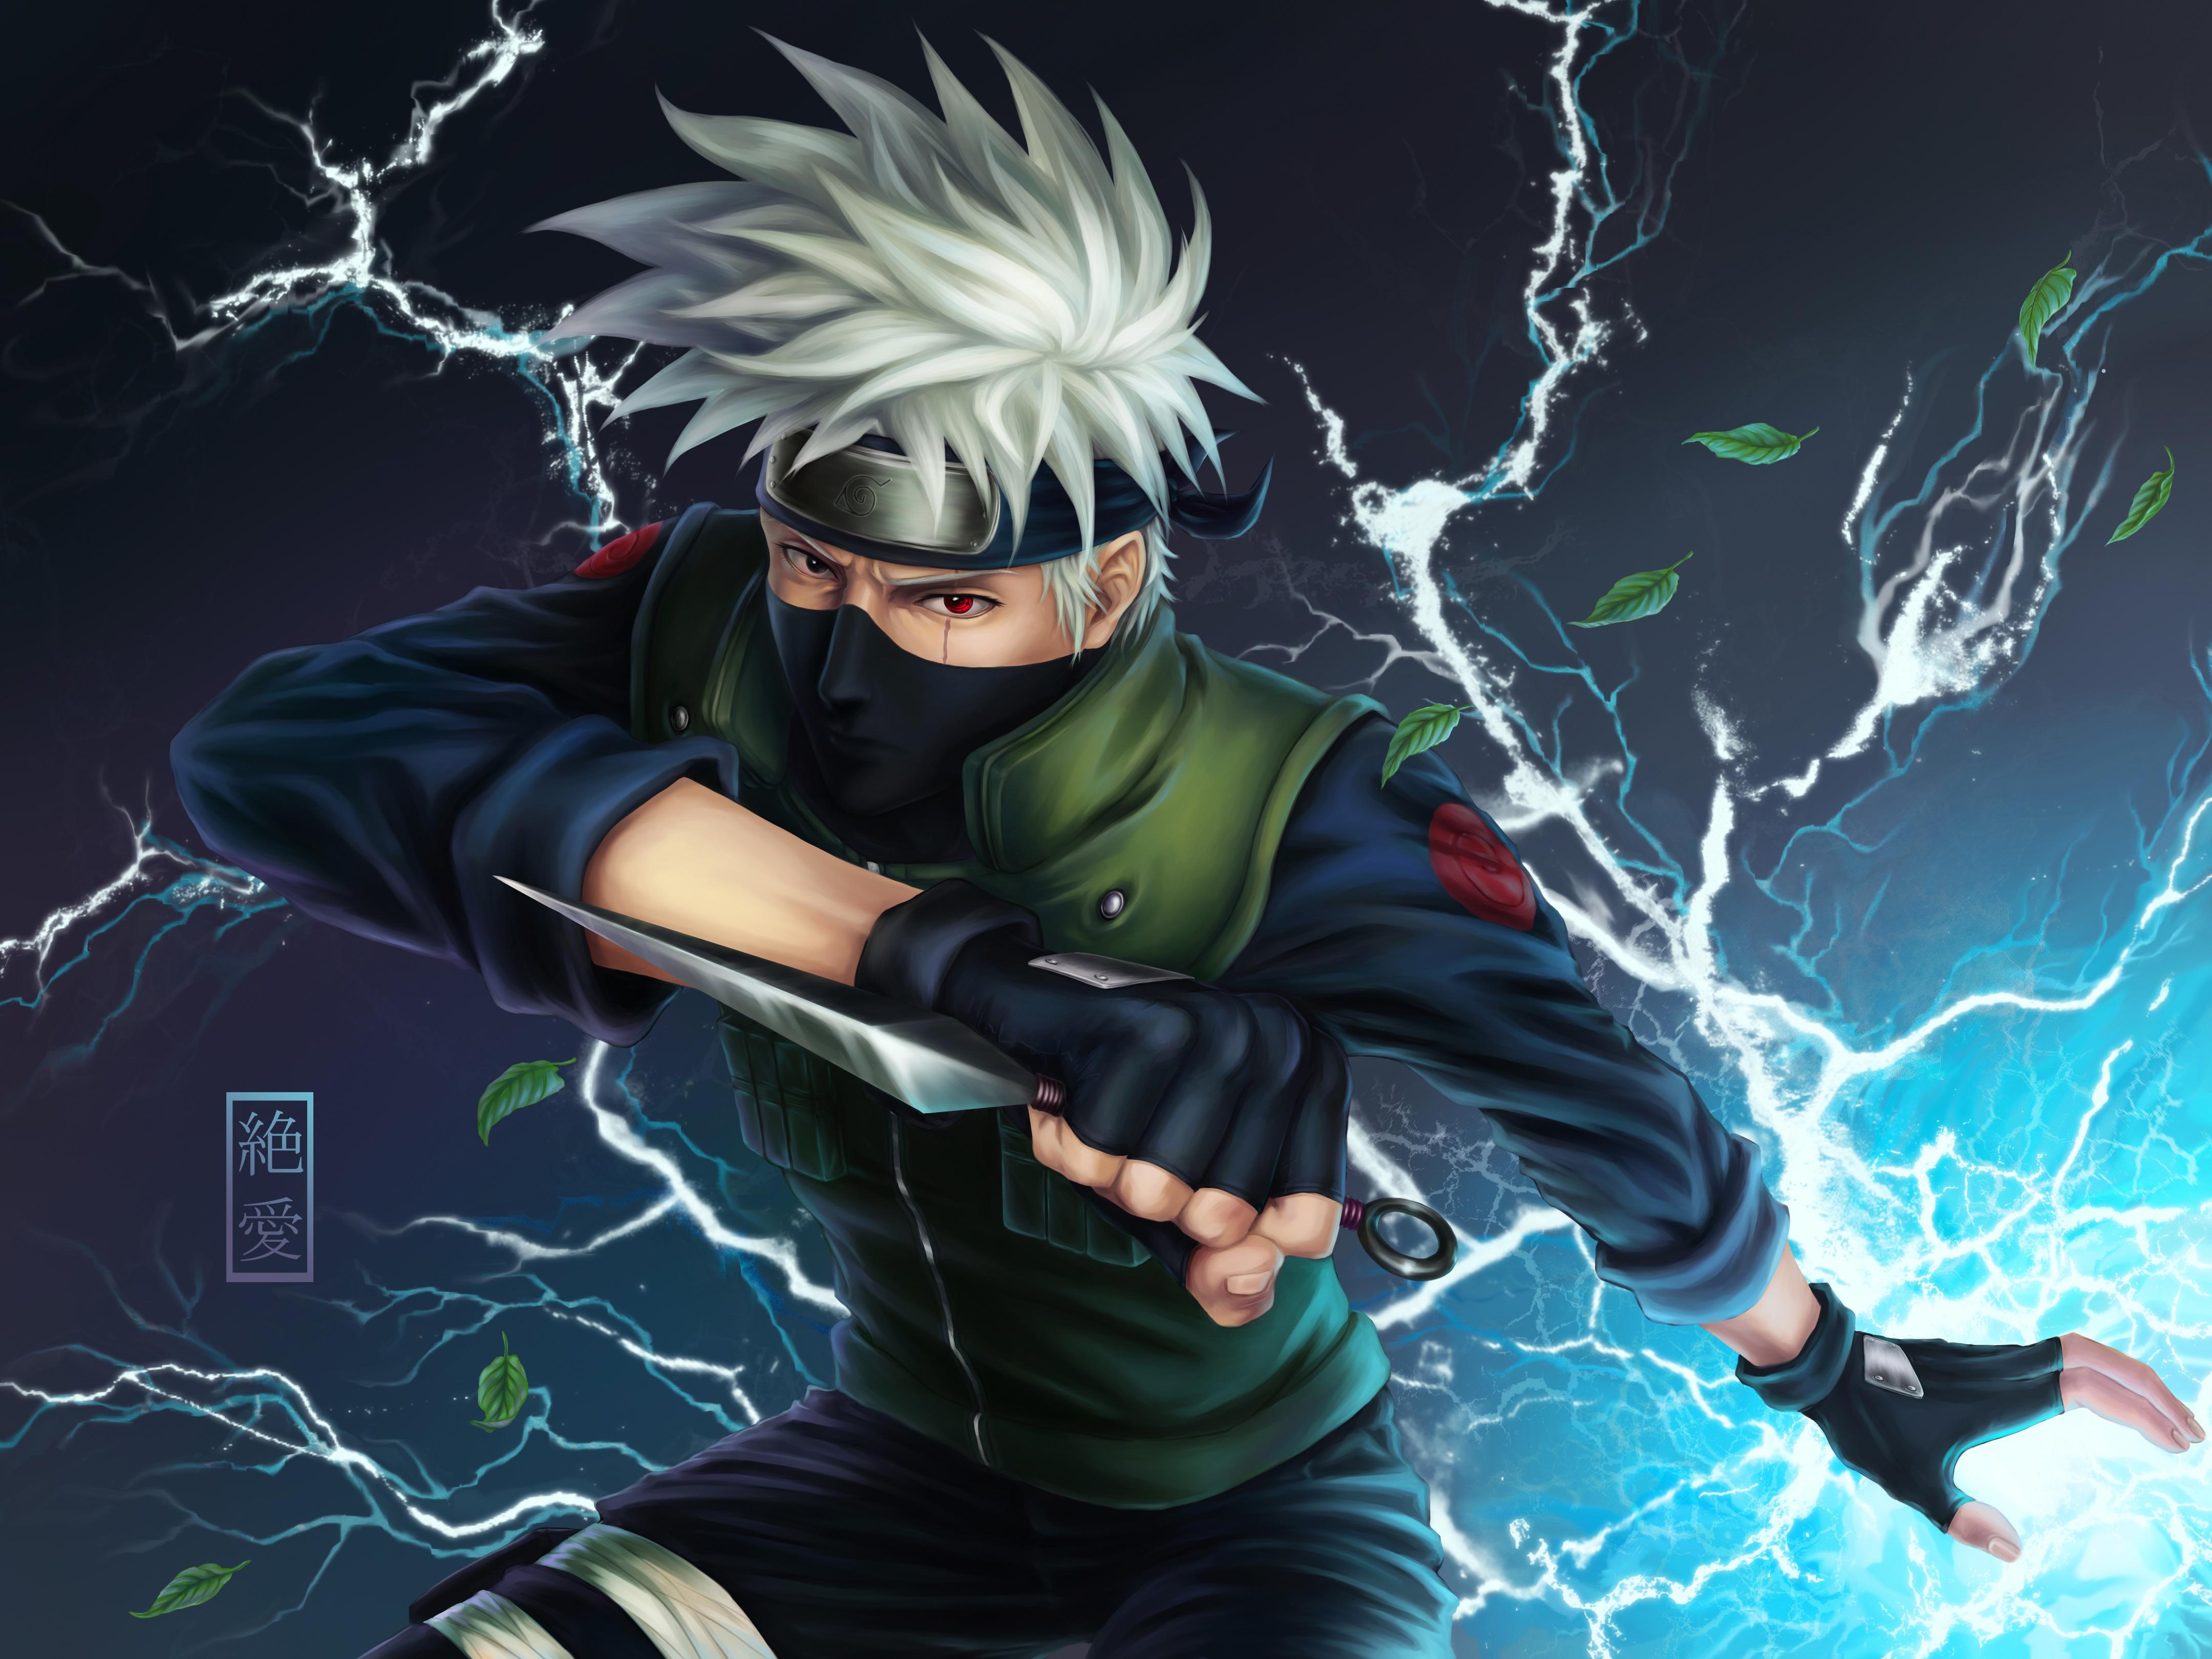 Kakashi Hatake 4k Hd Anime 4k Wallpapers Images Backgrounds